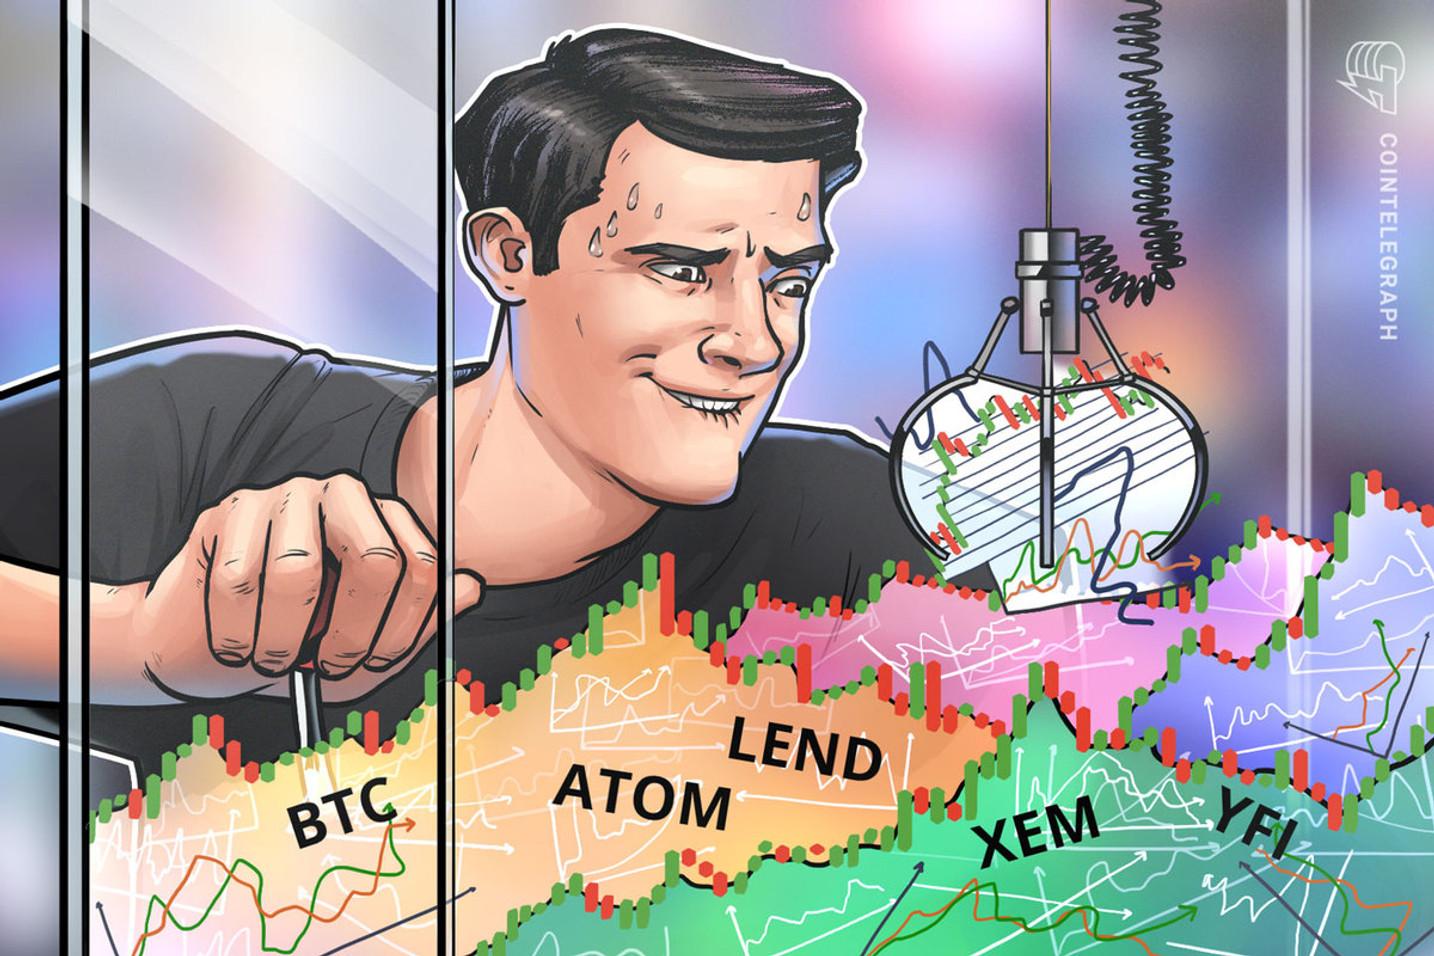 Top 5 Cryptocurrencies to Watch This Week: BTC, ATOM, LEND, XEM, YFI